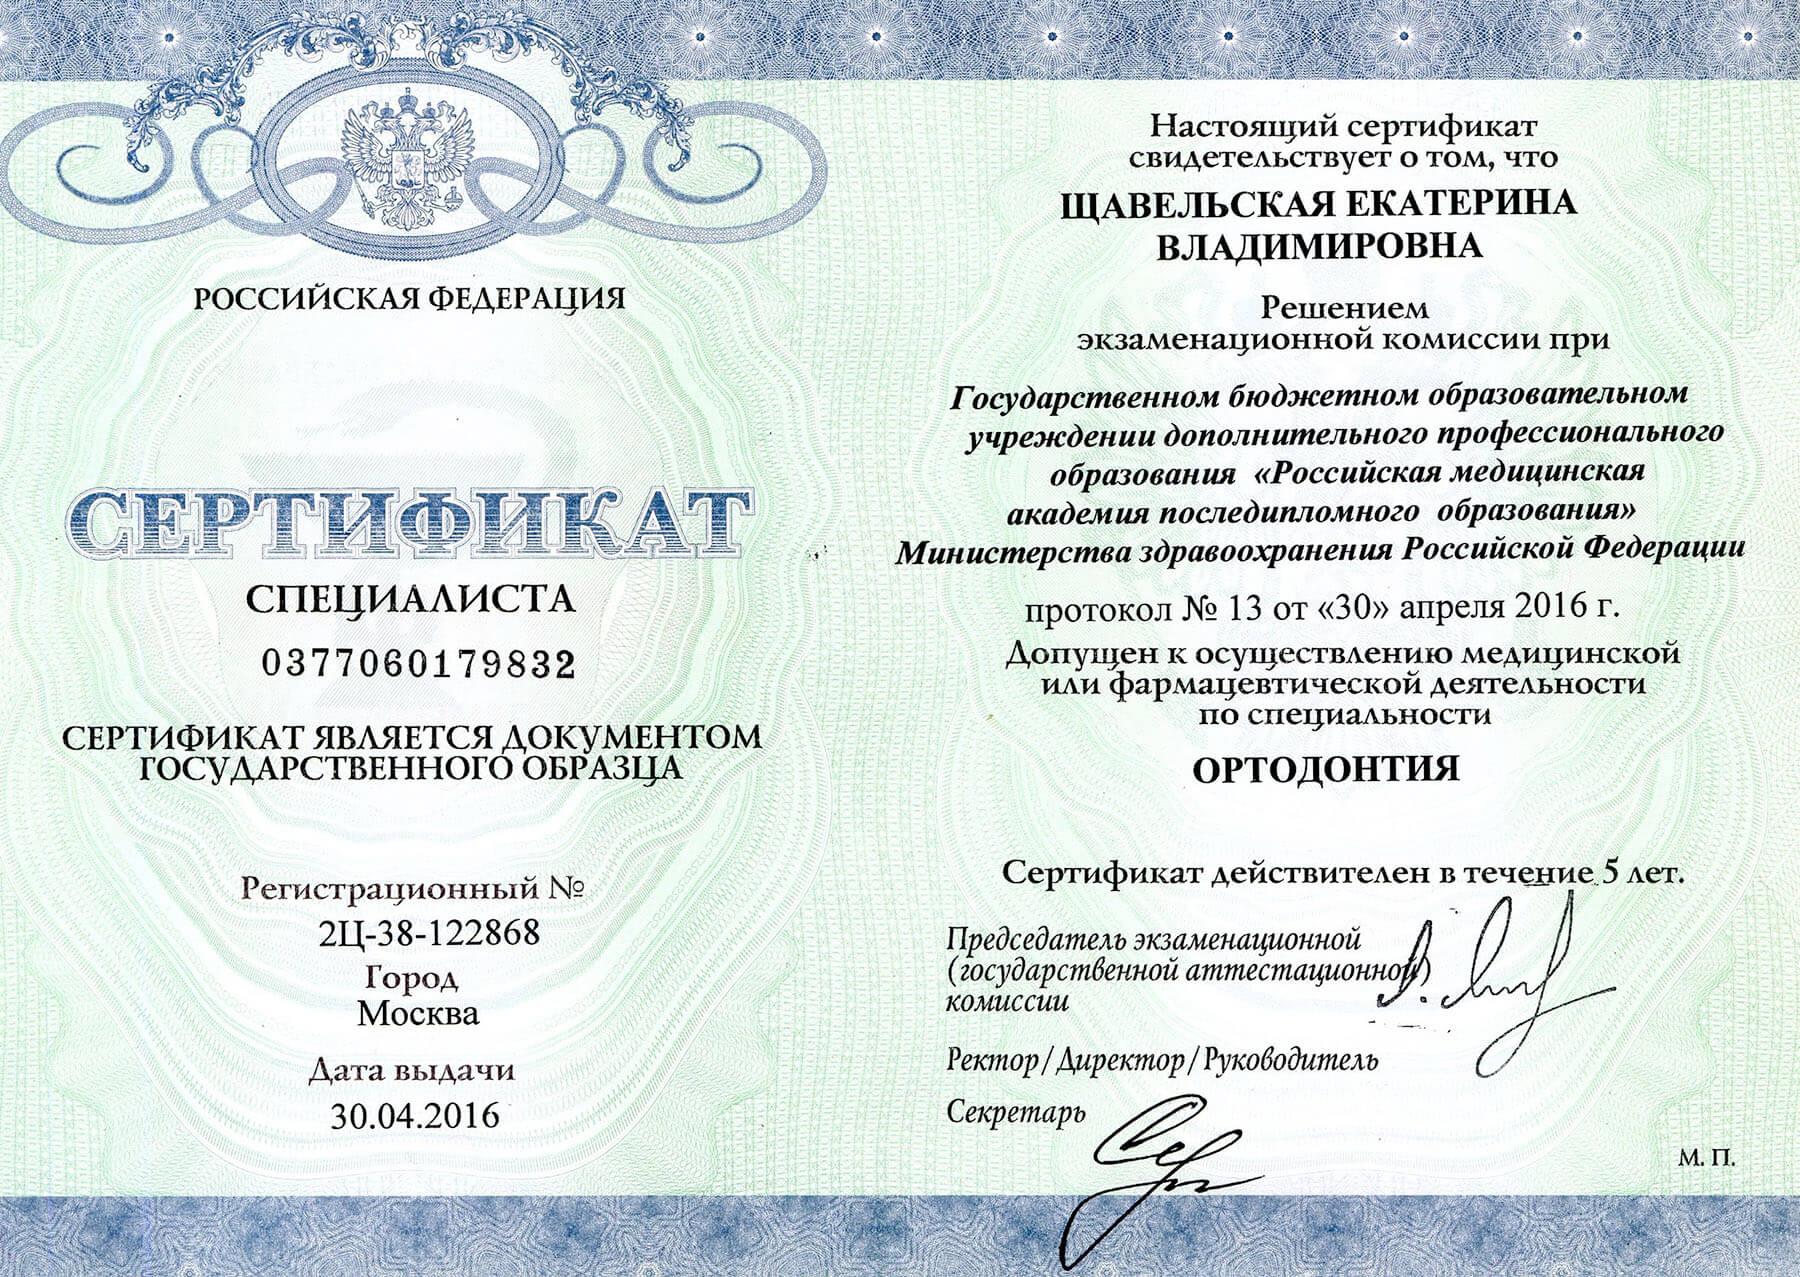 licences-image